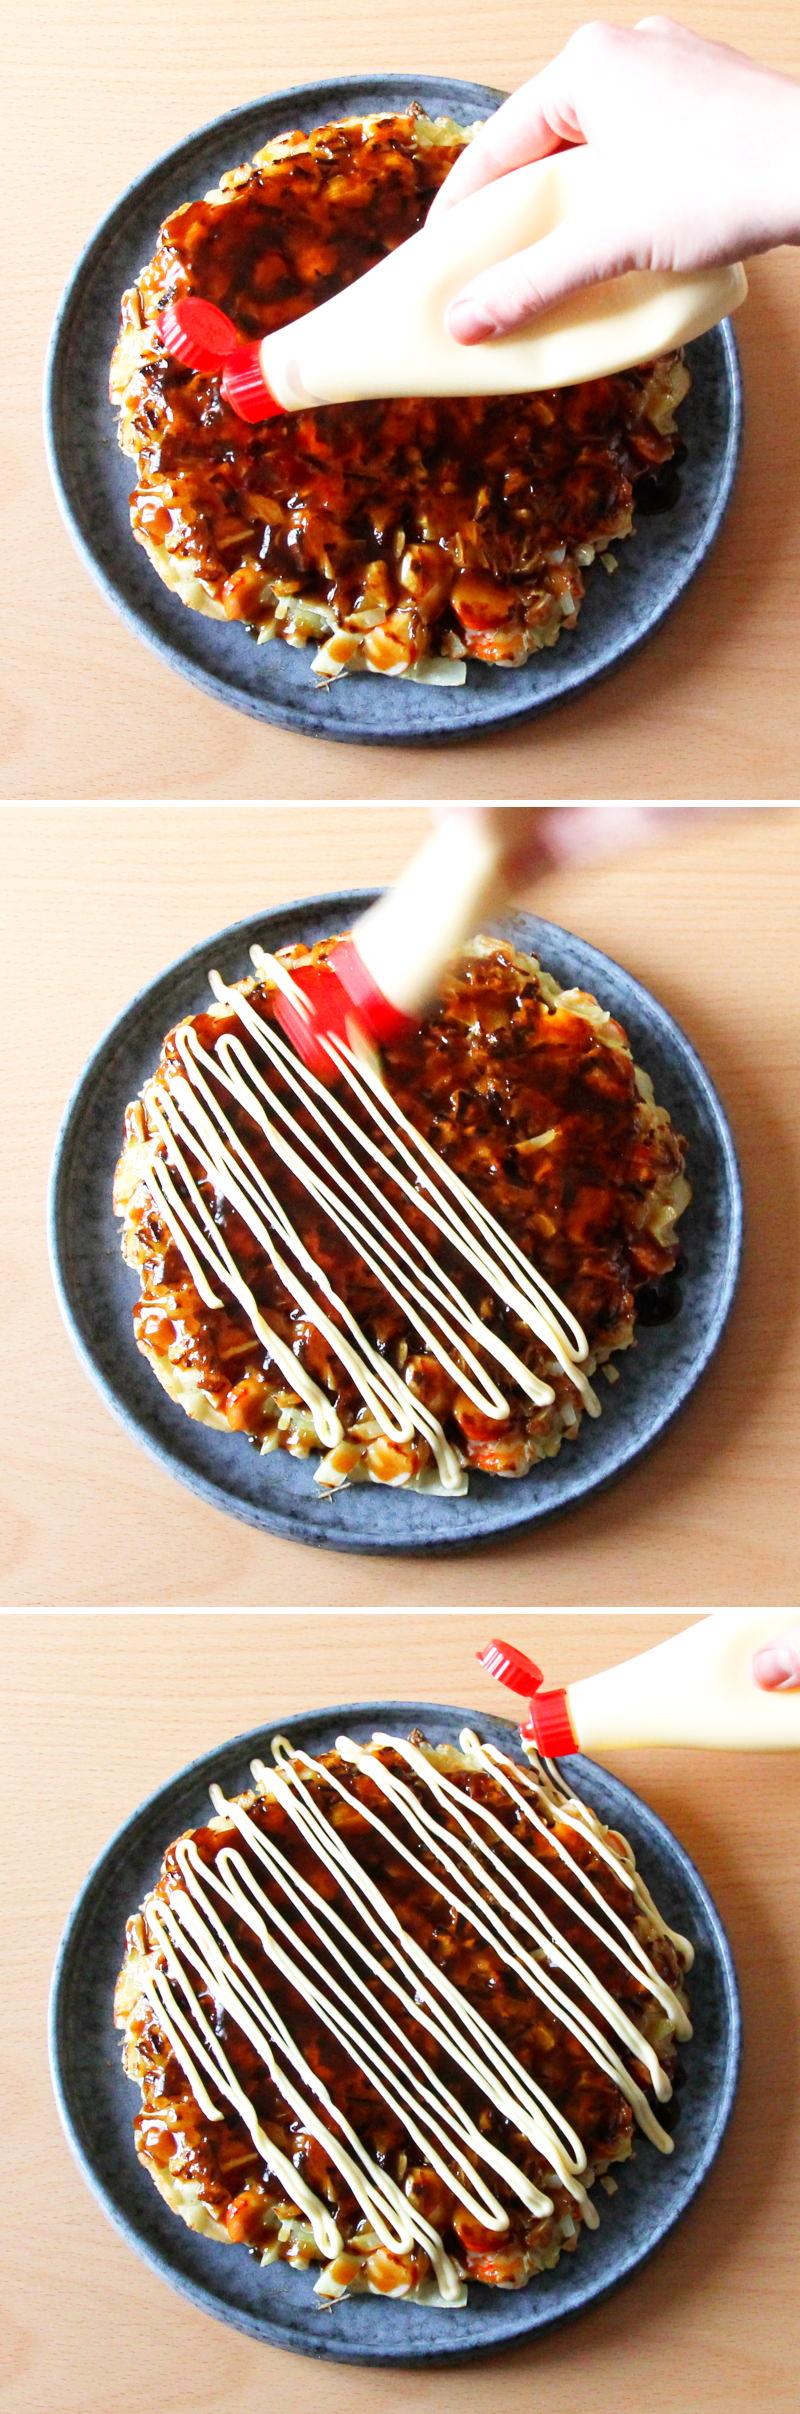 Grundrezept Okonomiyaki Schritt 9 Teig mit Mayonnaise verzieren